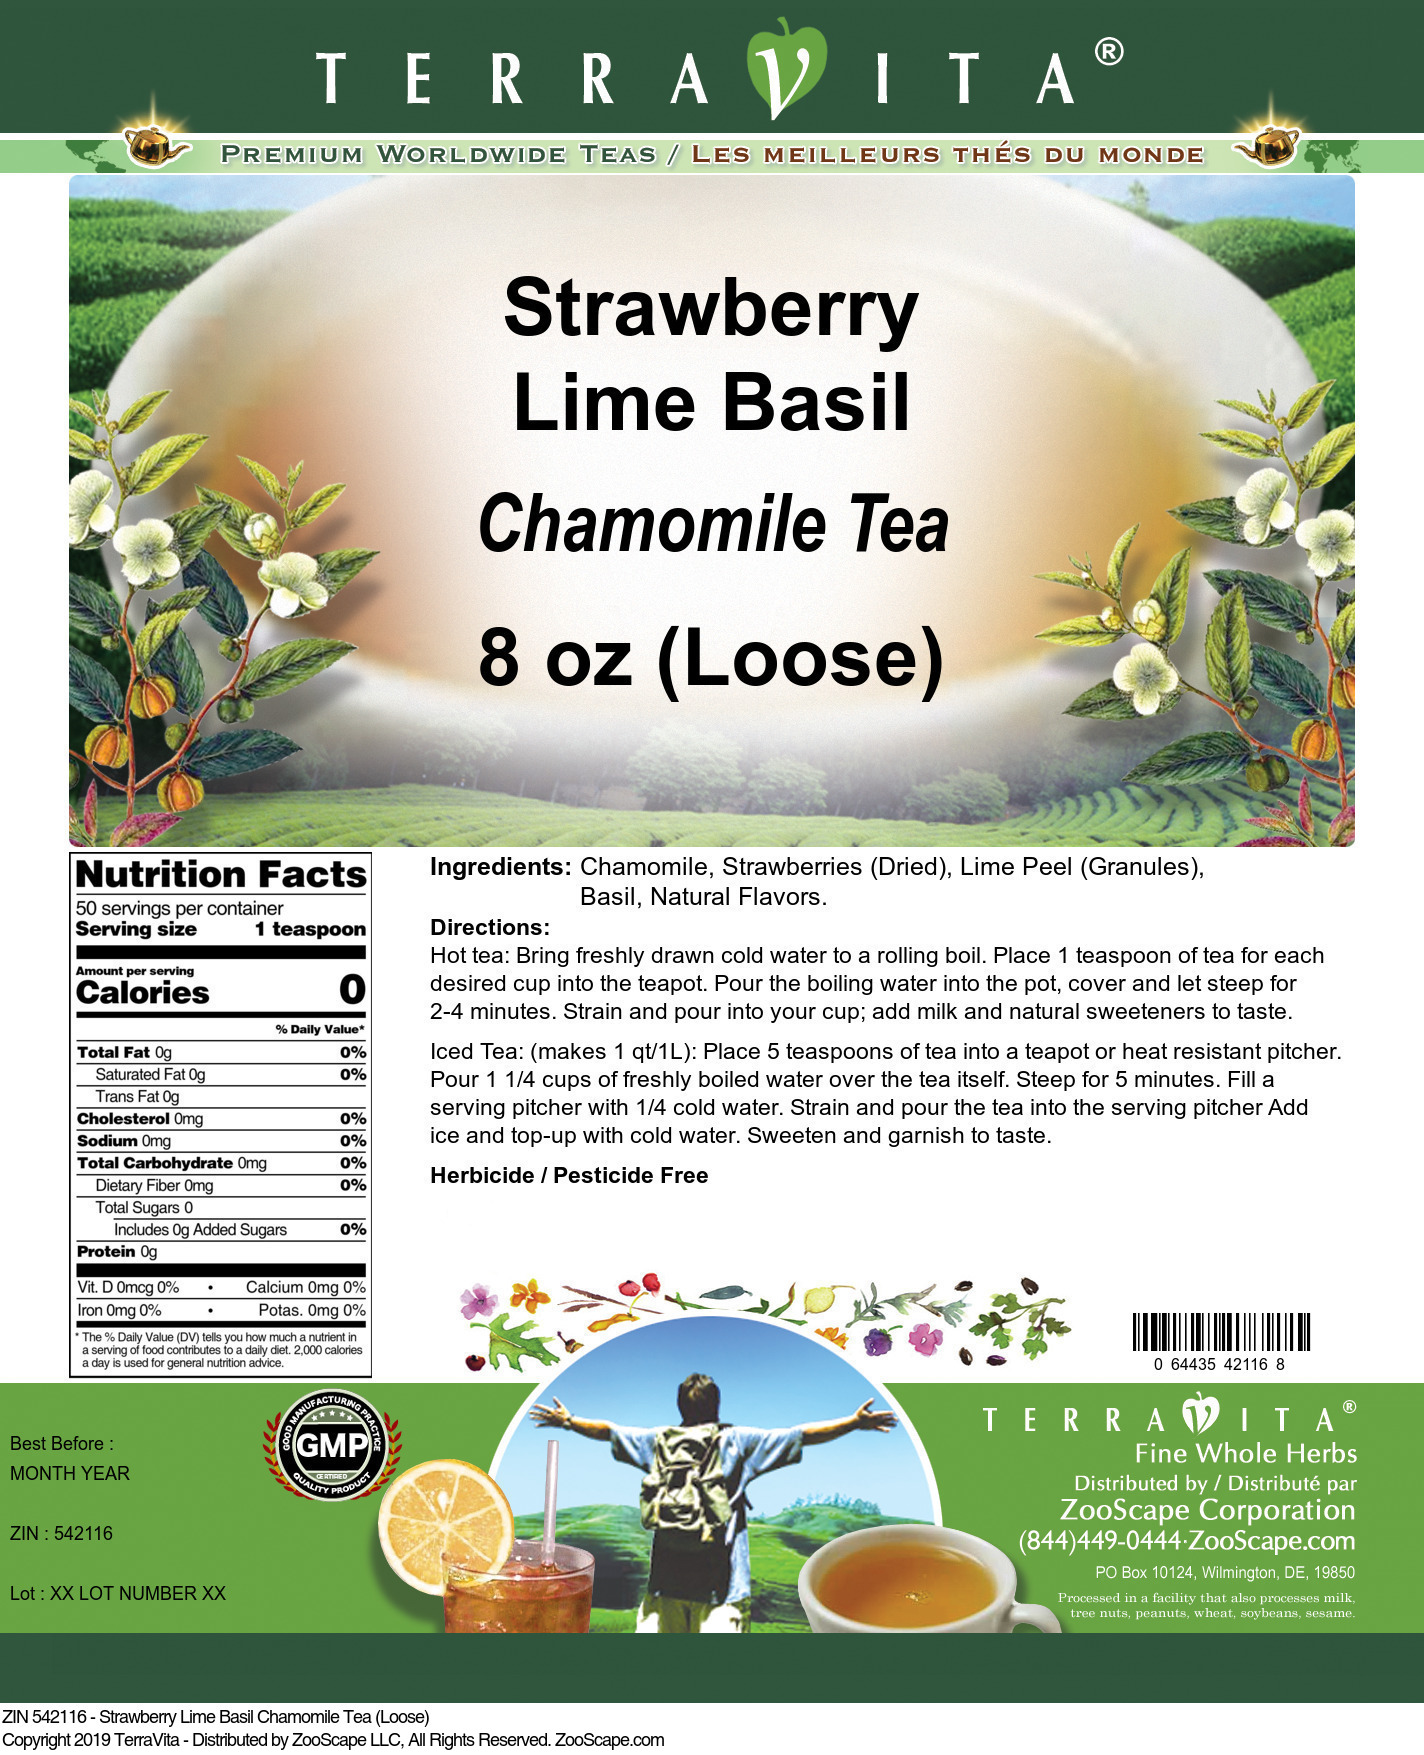 Strawberry Lime Basil Chamomile Tea